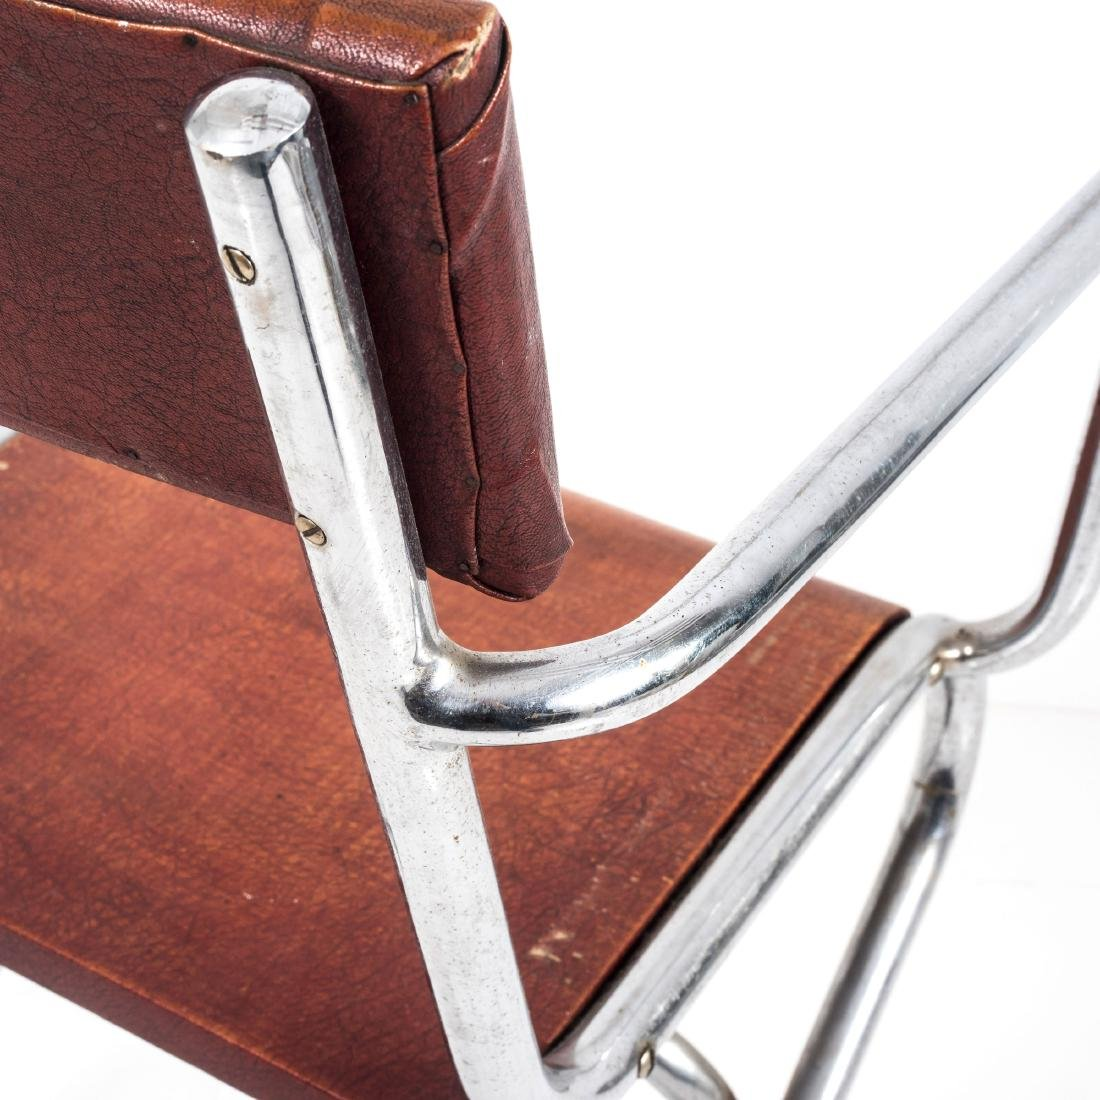 Tubular steel chair, 1939 - 2